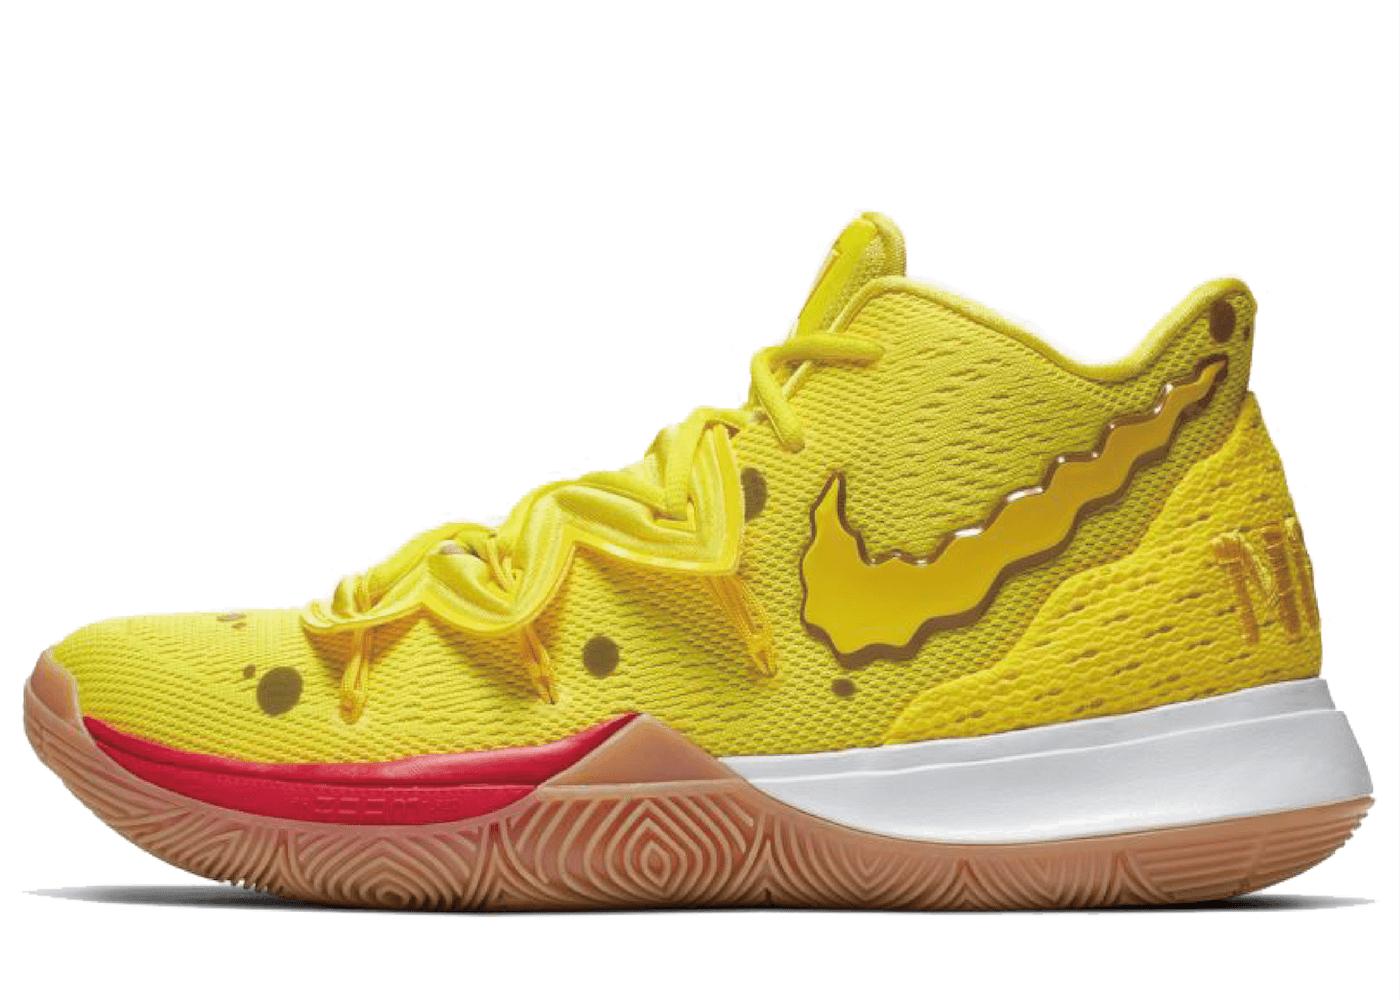 Nike Kyrie 5 Spongebob Squarepantsの写真